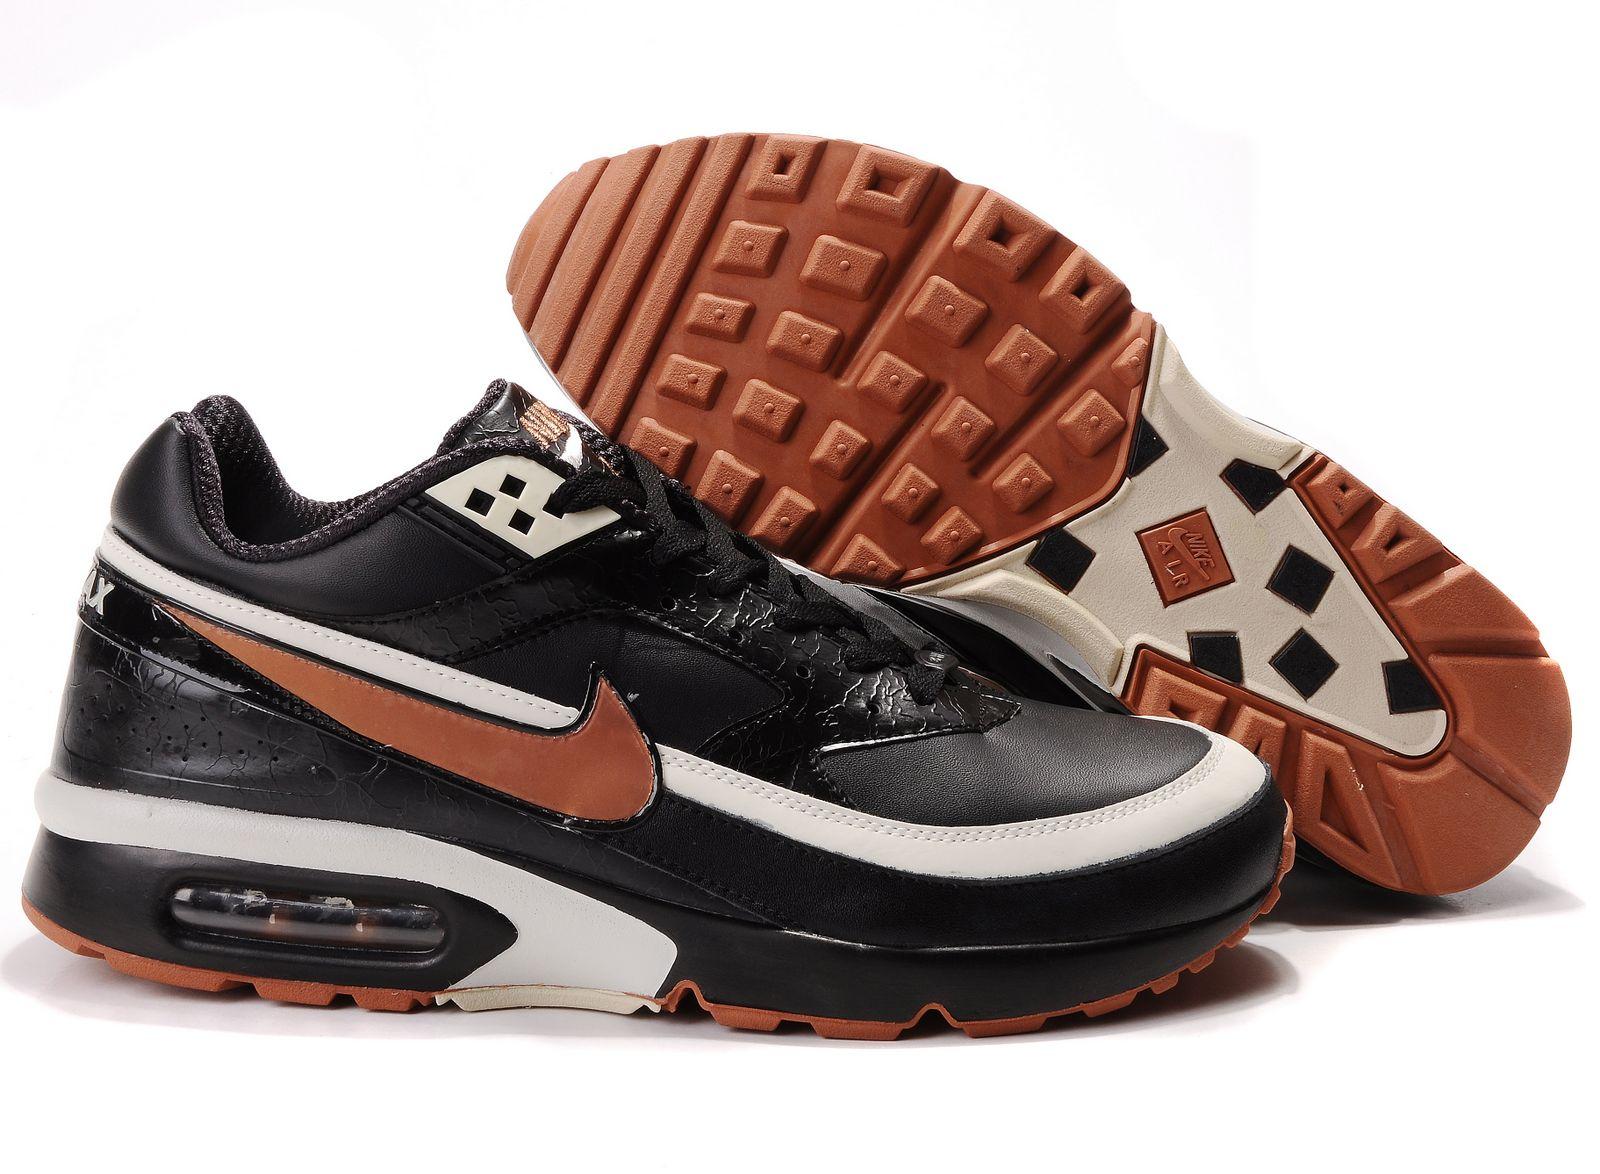 detailed look 4aeb1 51fec Chaussures Bw Noir Brun Hommes Pas Chere,air max bw,en promotion